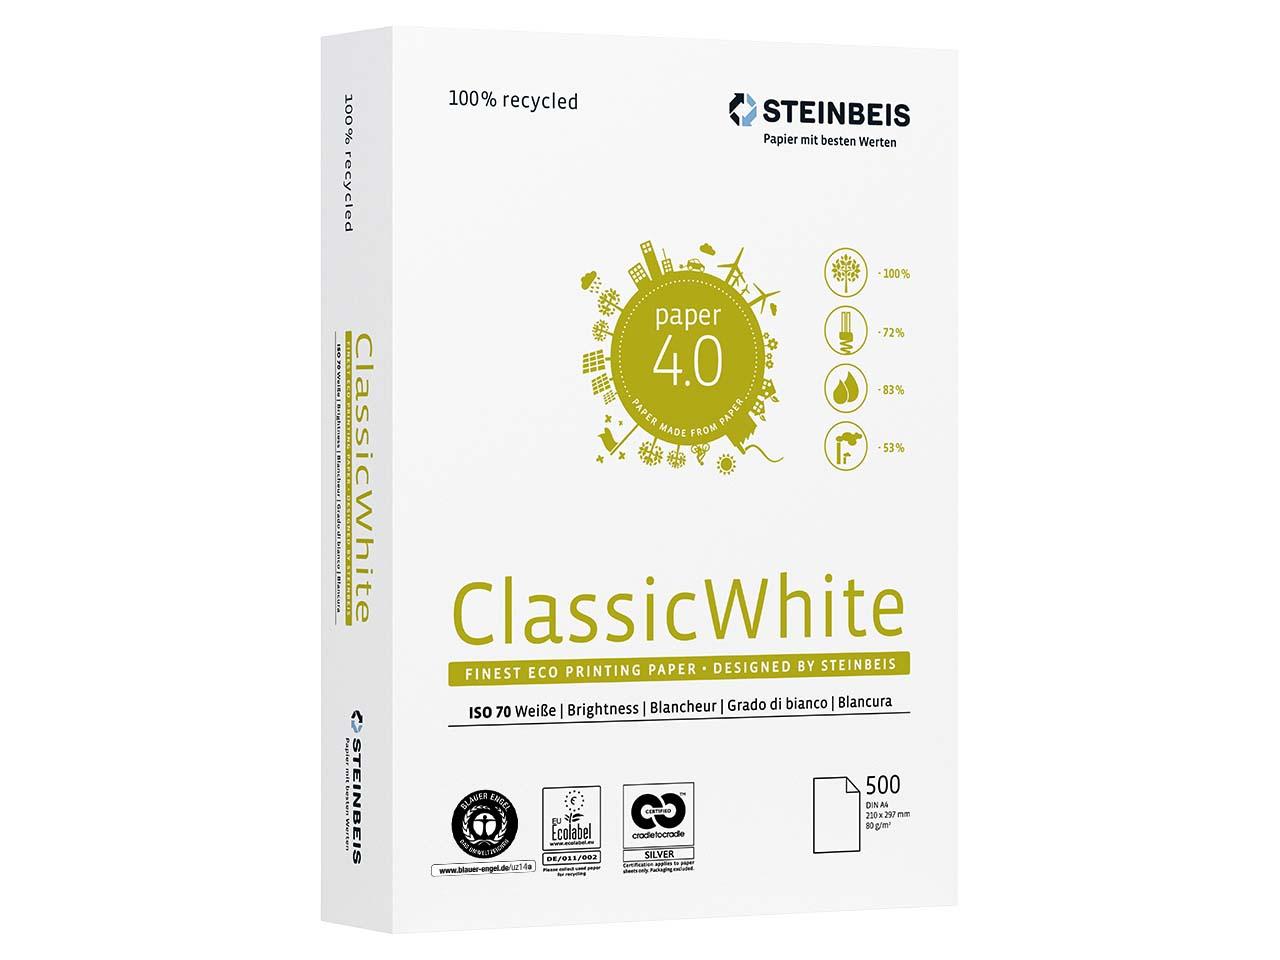 Бумага А4 80гр./м2. 500 лист. Classic White ISO 70/СІЕ 55 на 100% из втор. сырья, сероватый оттенок STEINBEIS - фото 1